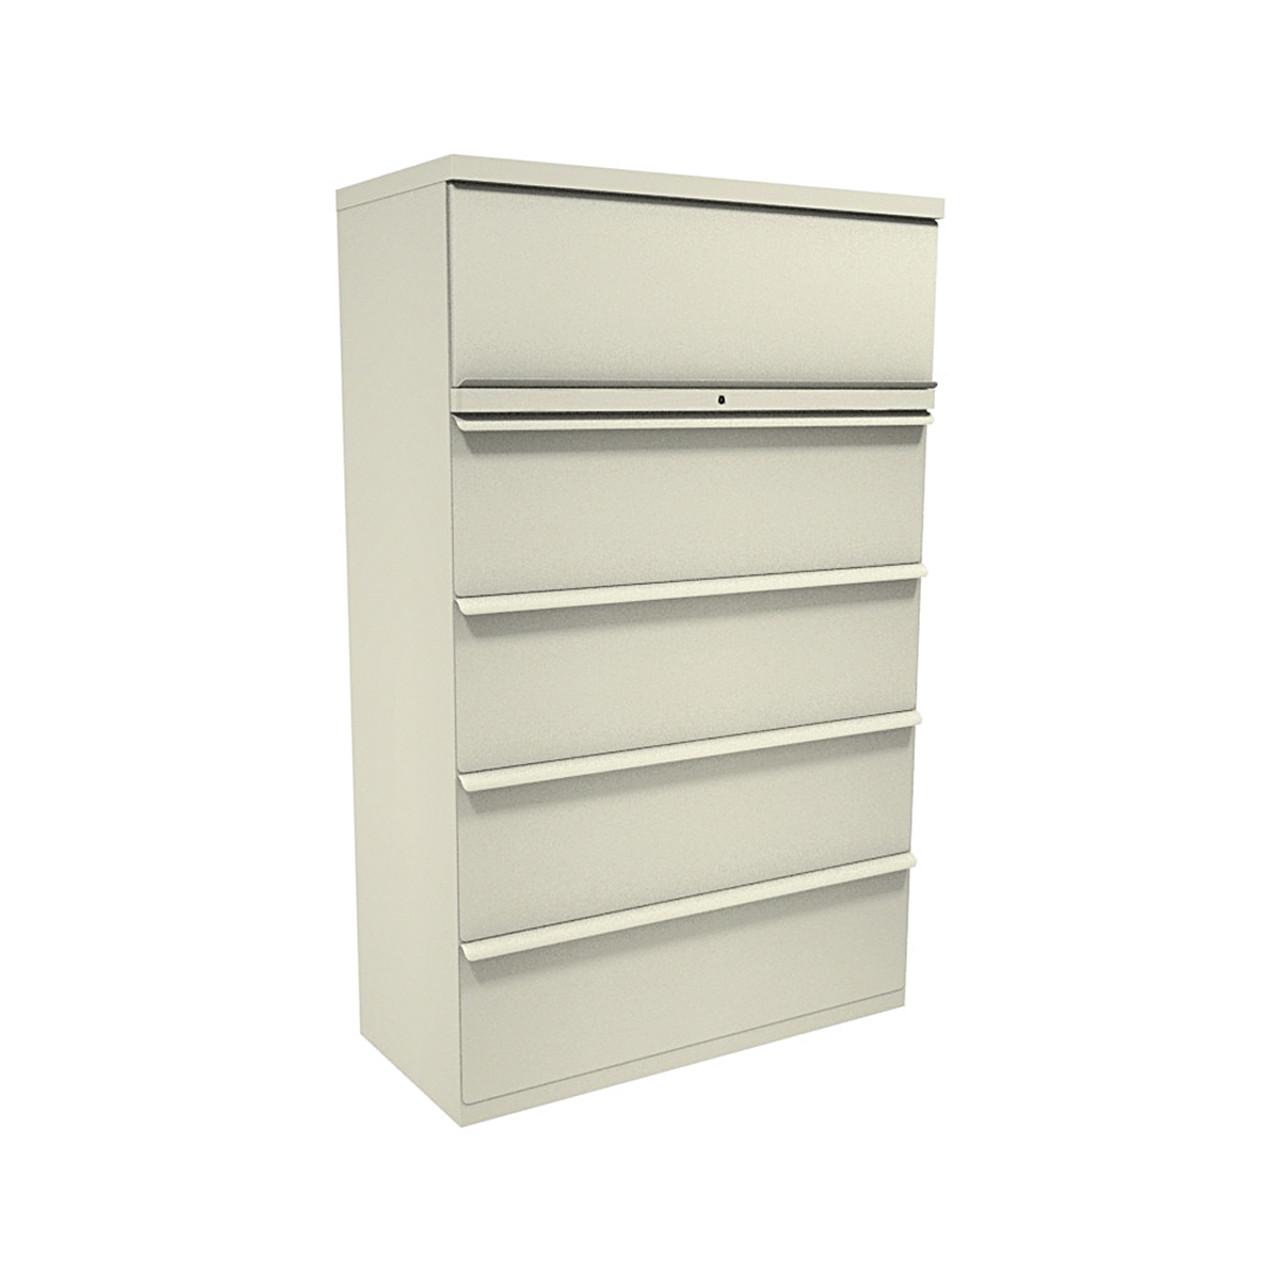 File Cabinets & Pedestals